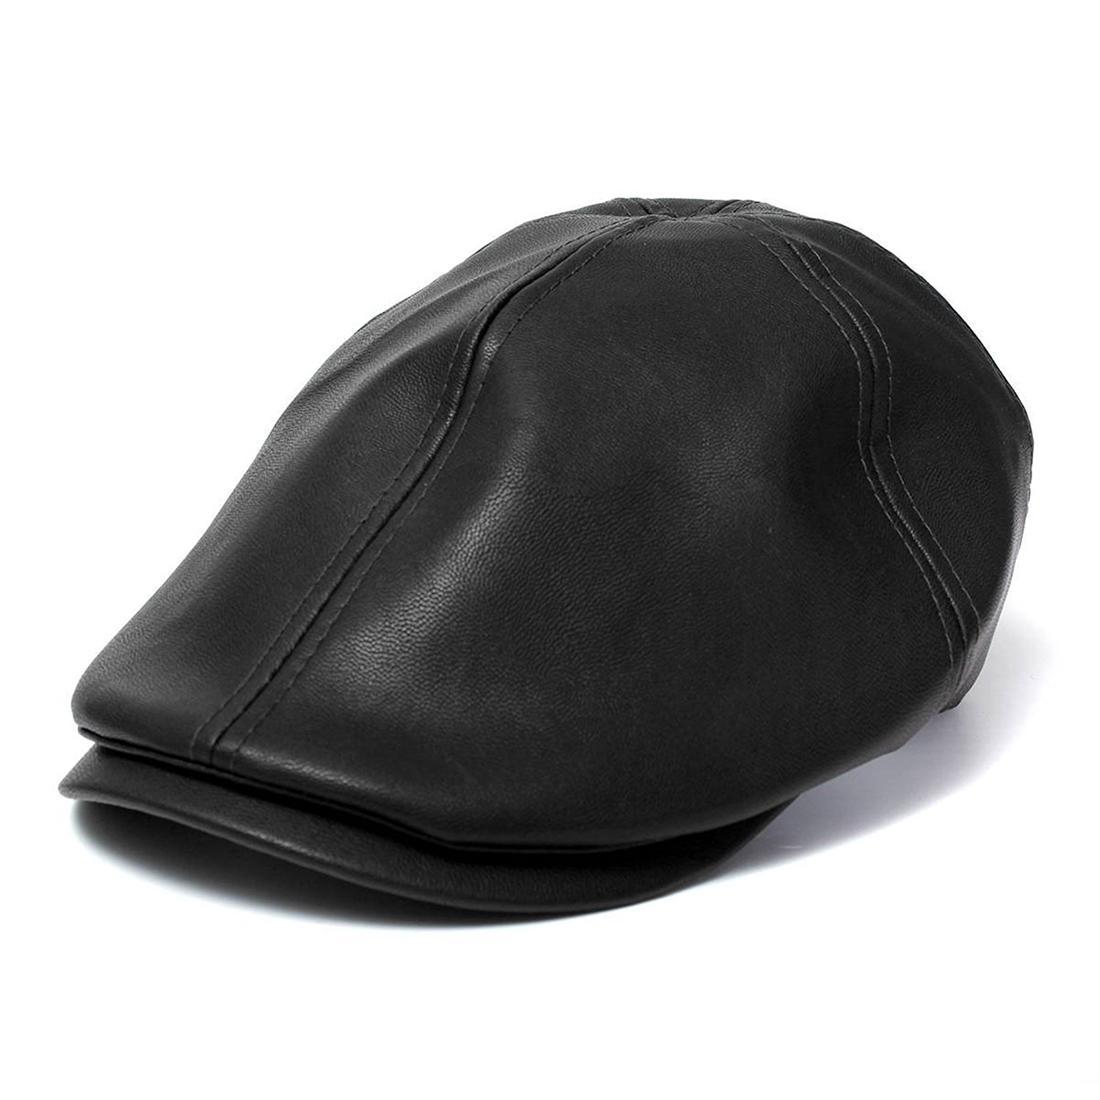 Compre Sombrero De Boina De Hombre Femenino Gorra De Cuero Gorro De  Camionero Unisex Bonnet Negro A  25.45 Del Pickled  2d5eaa38326